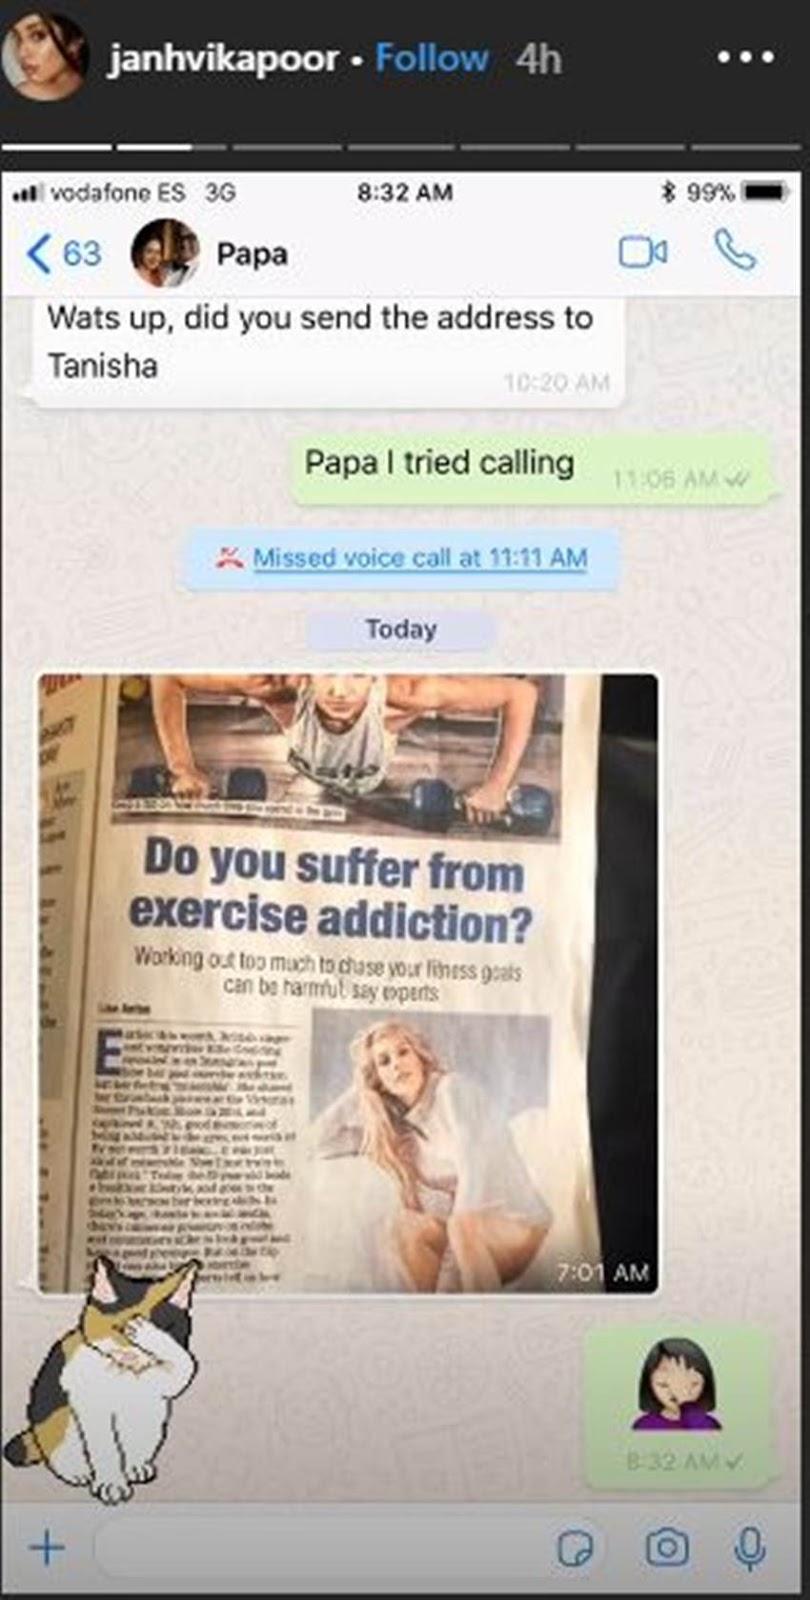 Jahnavi Kapoor and his father Bonnie Kapoor's Jahnavi Kapoor whatsapp Chat is getting viral